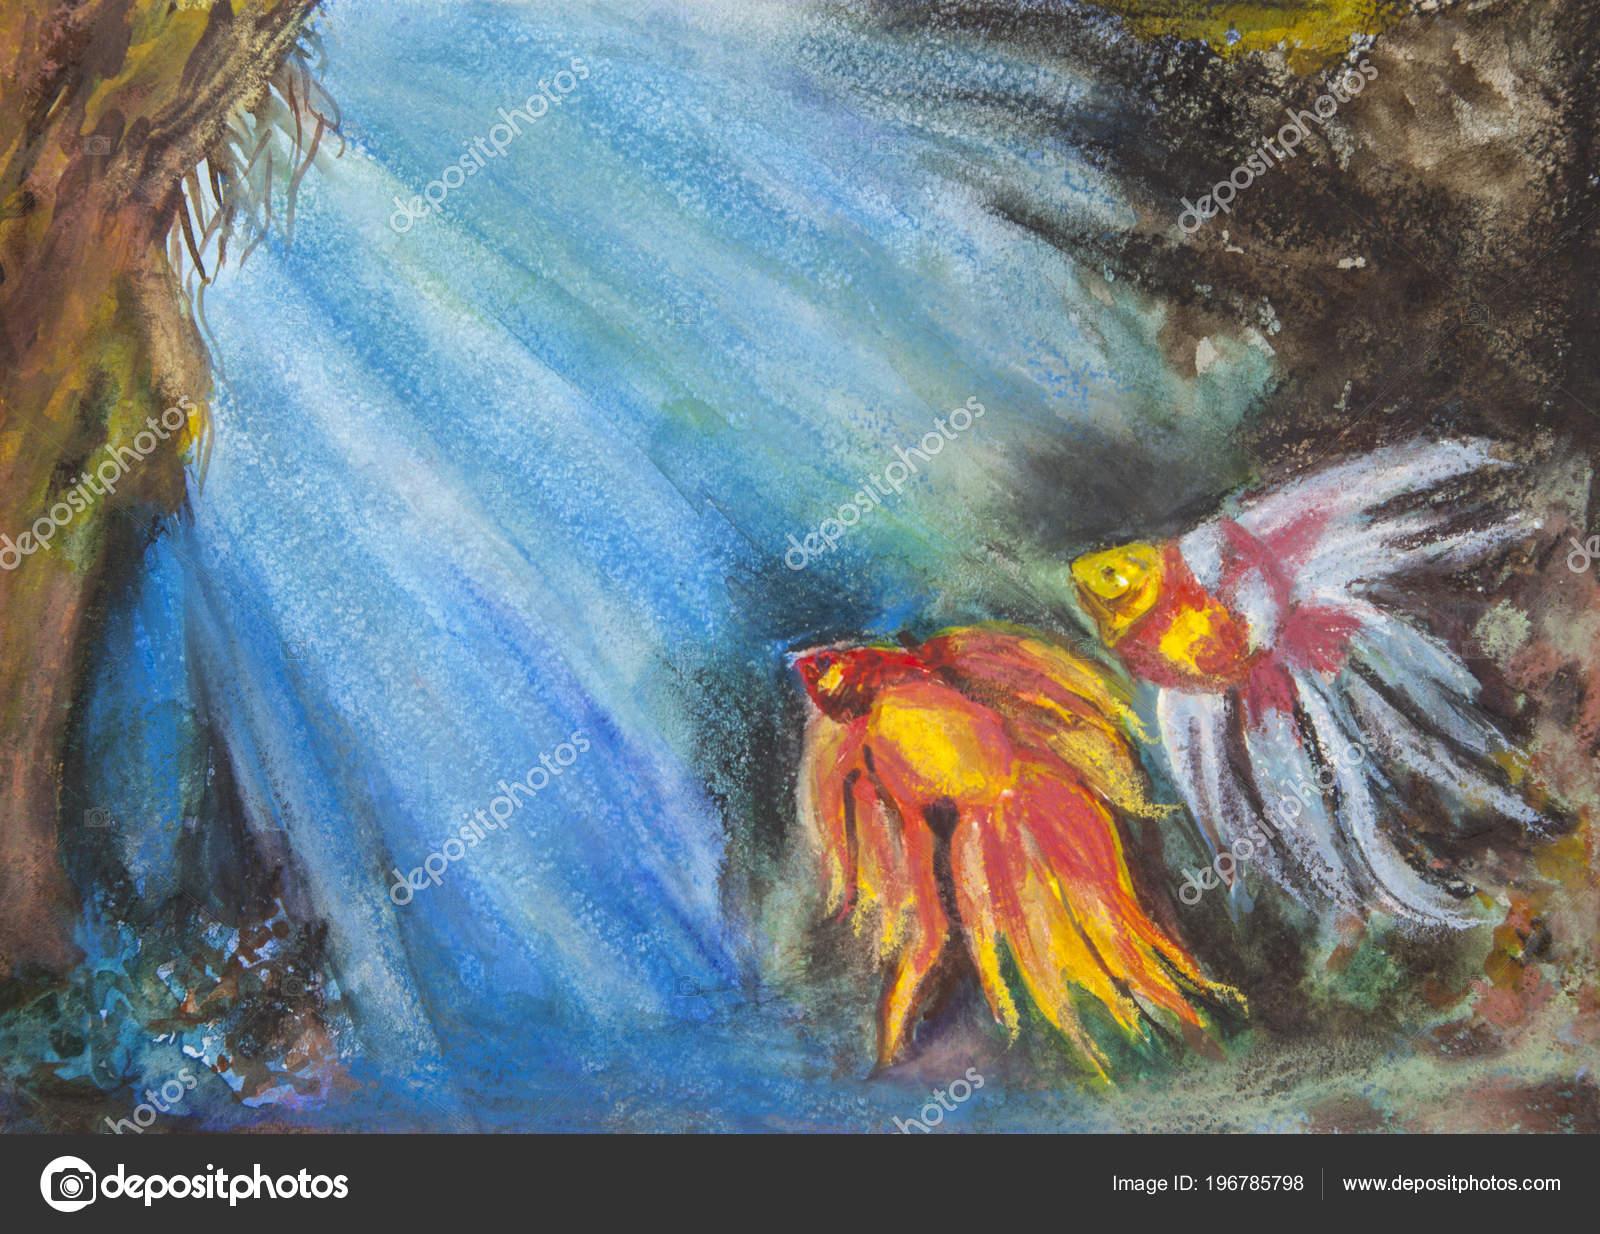 Kresba Akvarelem Dve Zlate Rybky Dne More Stock Fotografie C E M